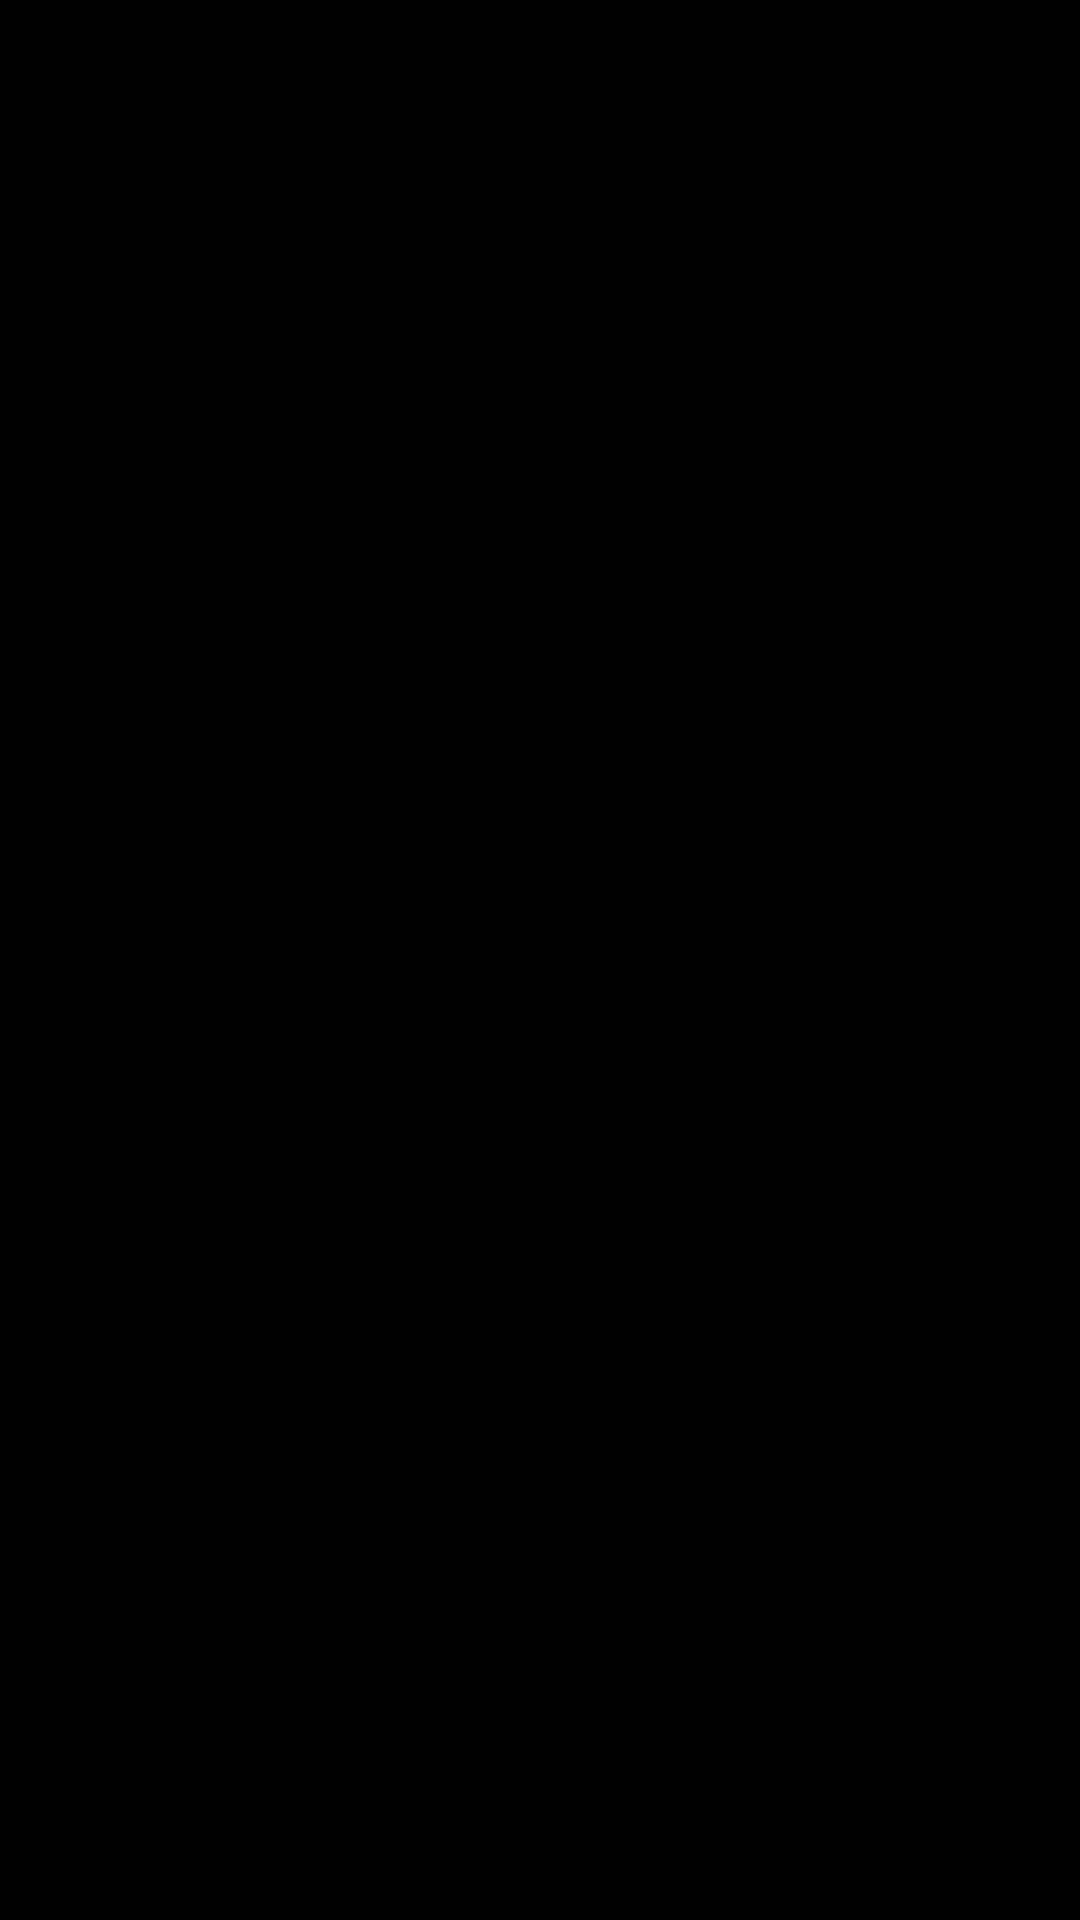 Plain black background download free hd wallpapers for - Black wallpaper for android download ...